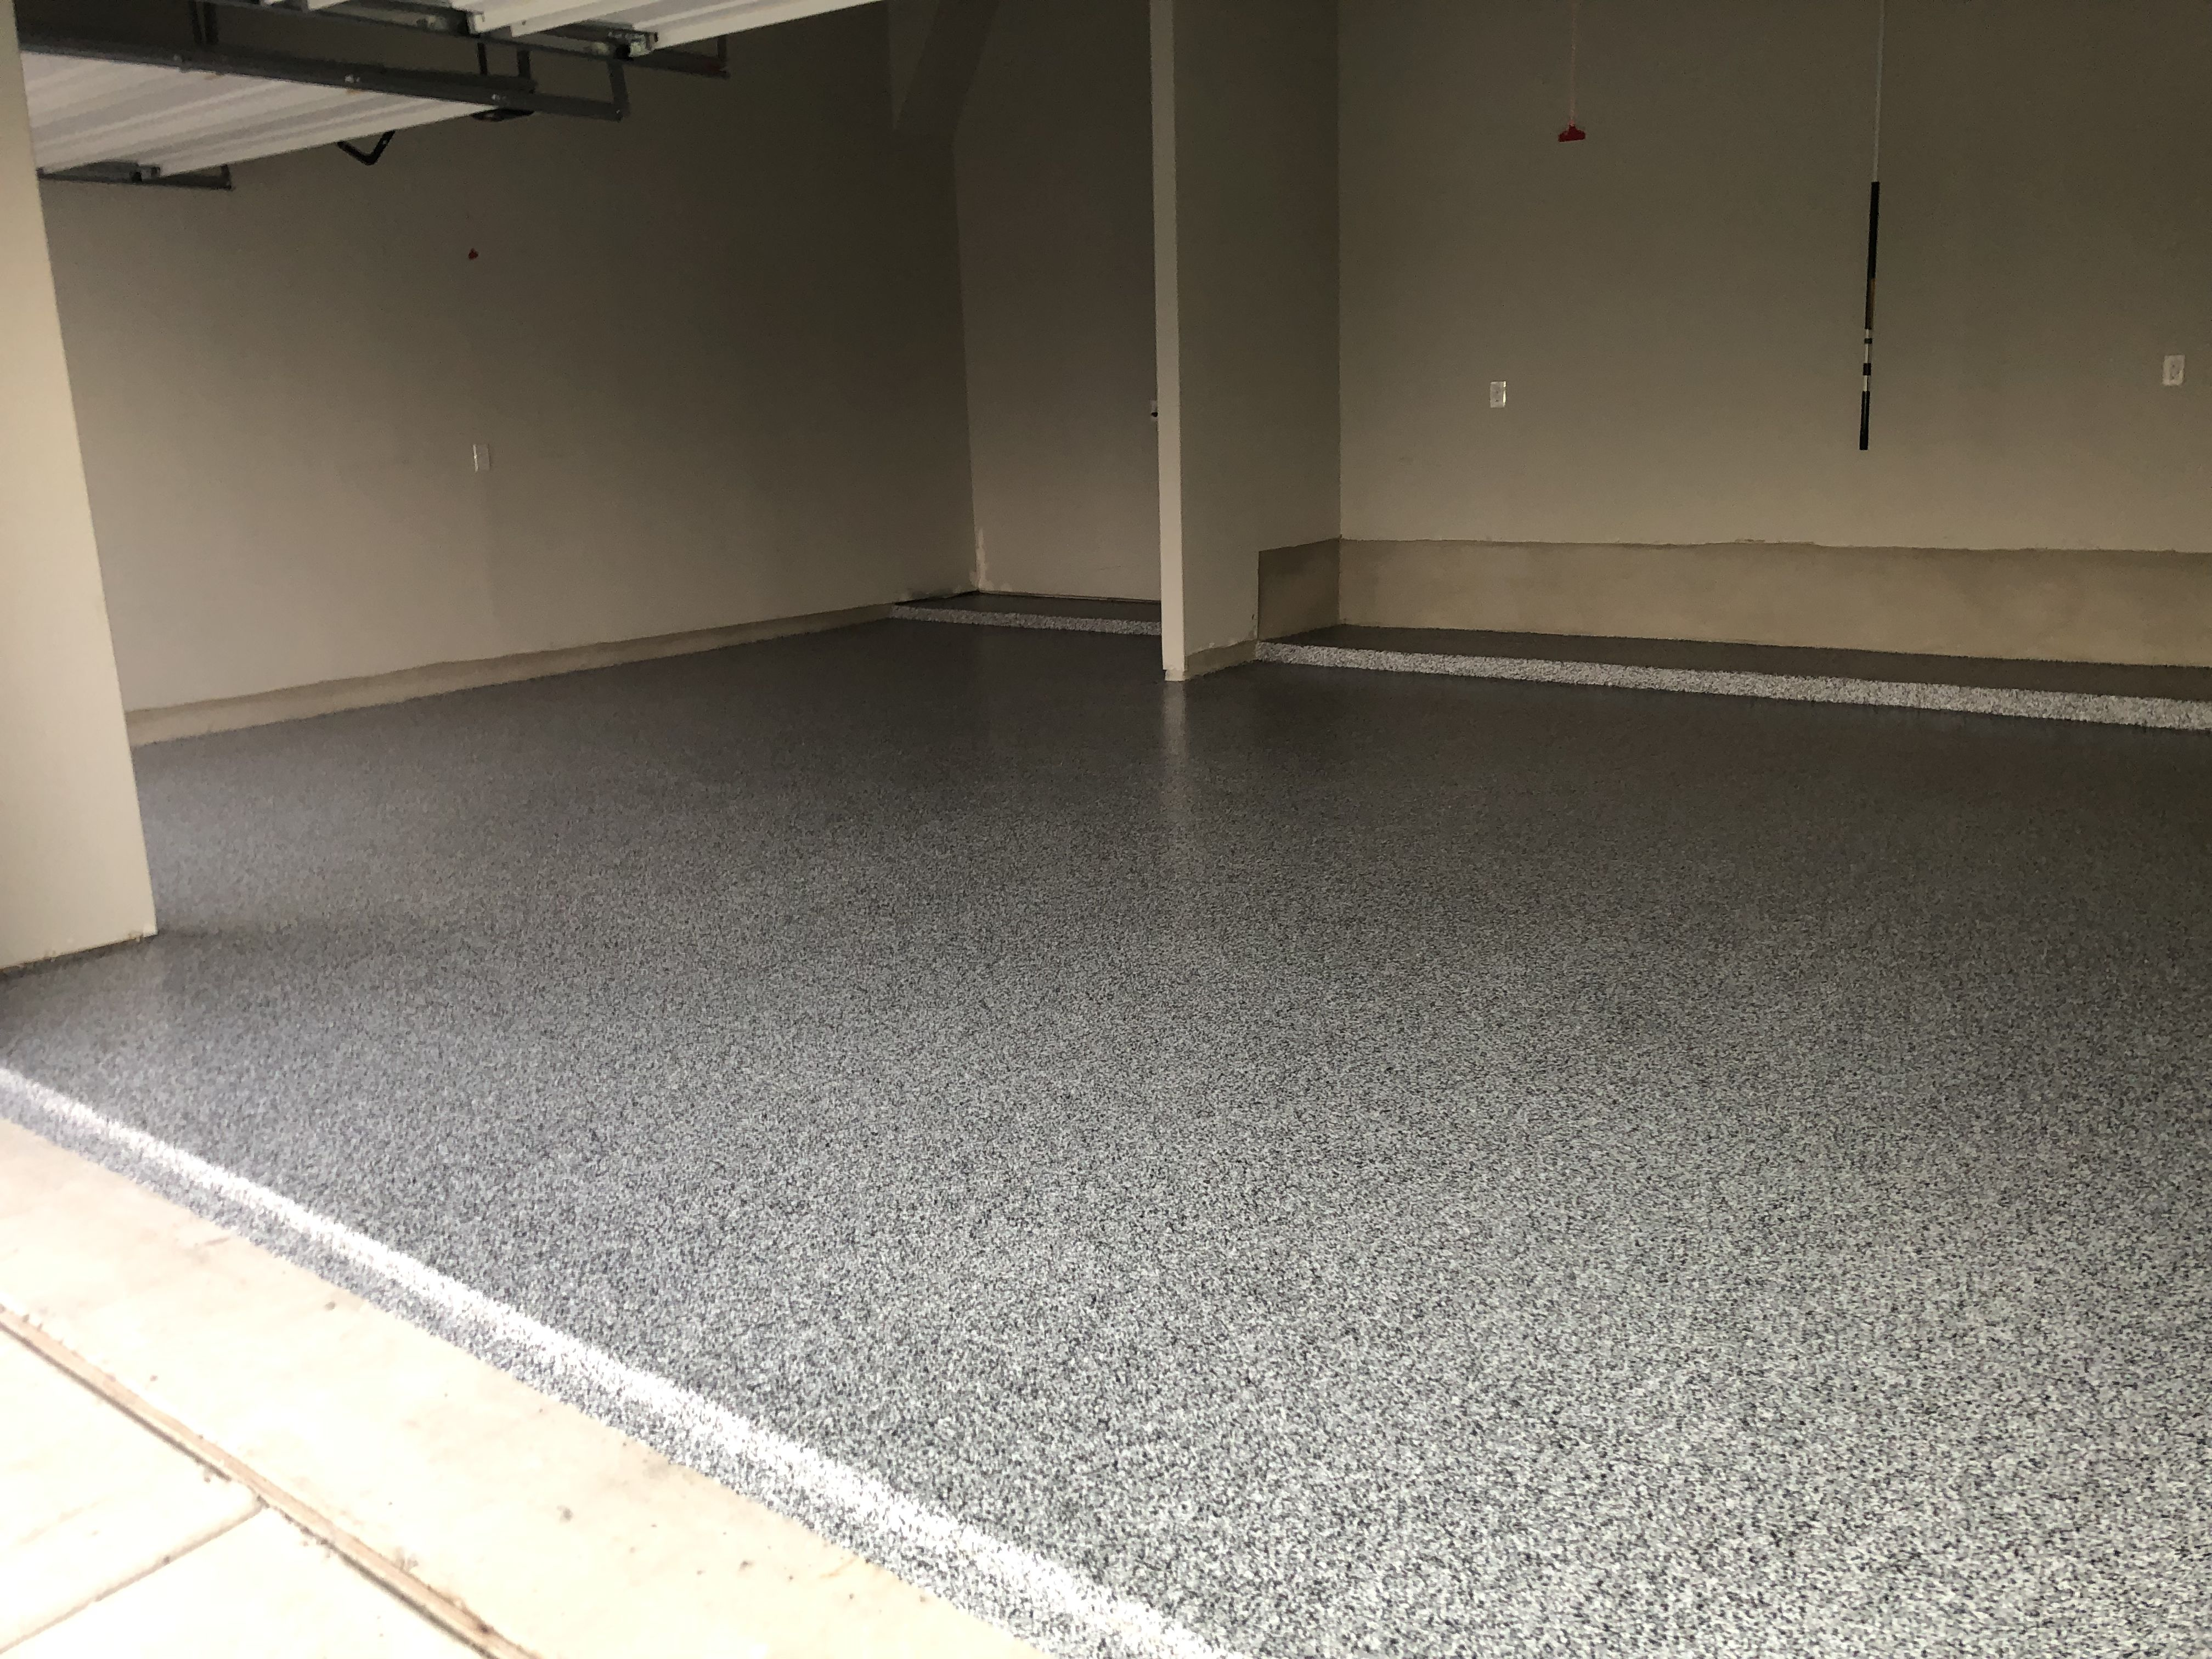 Uv Stable Epoxy Polyurethane Garage Flooring With Marble Flake